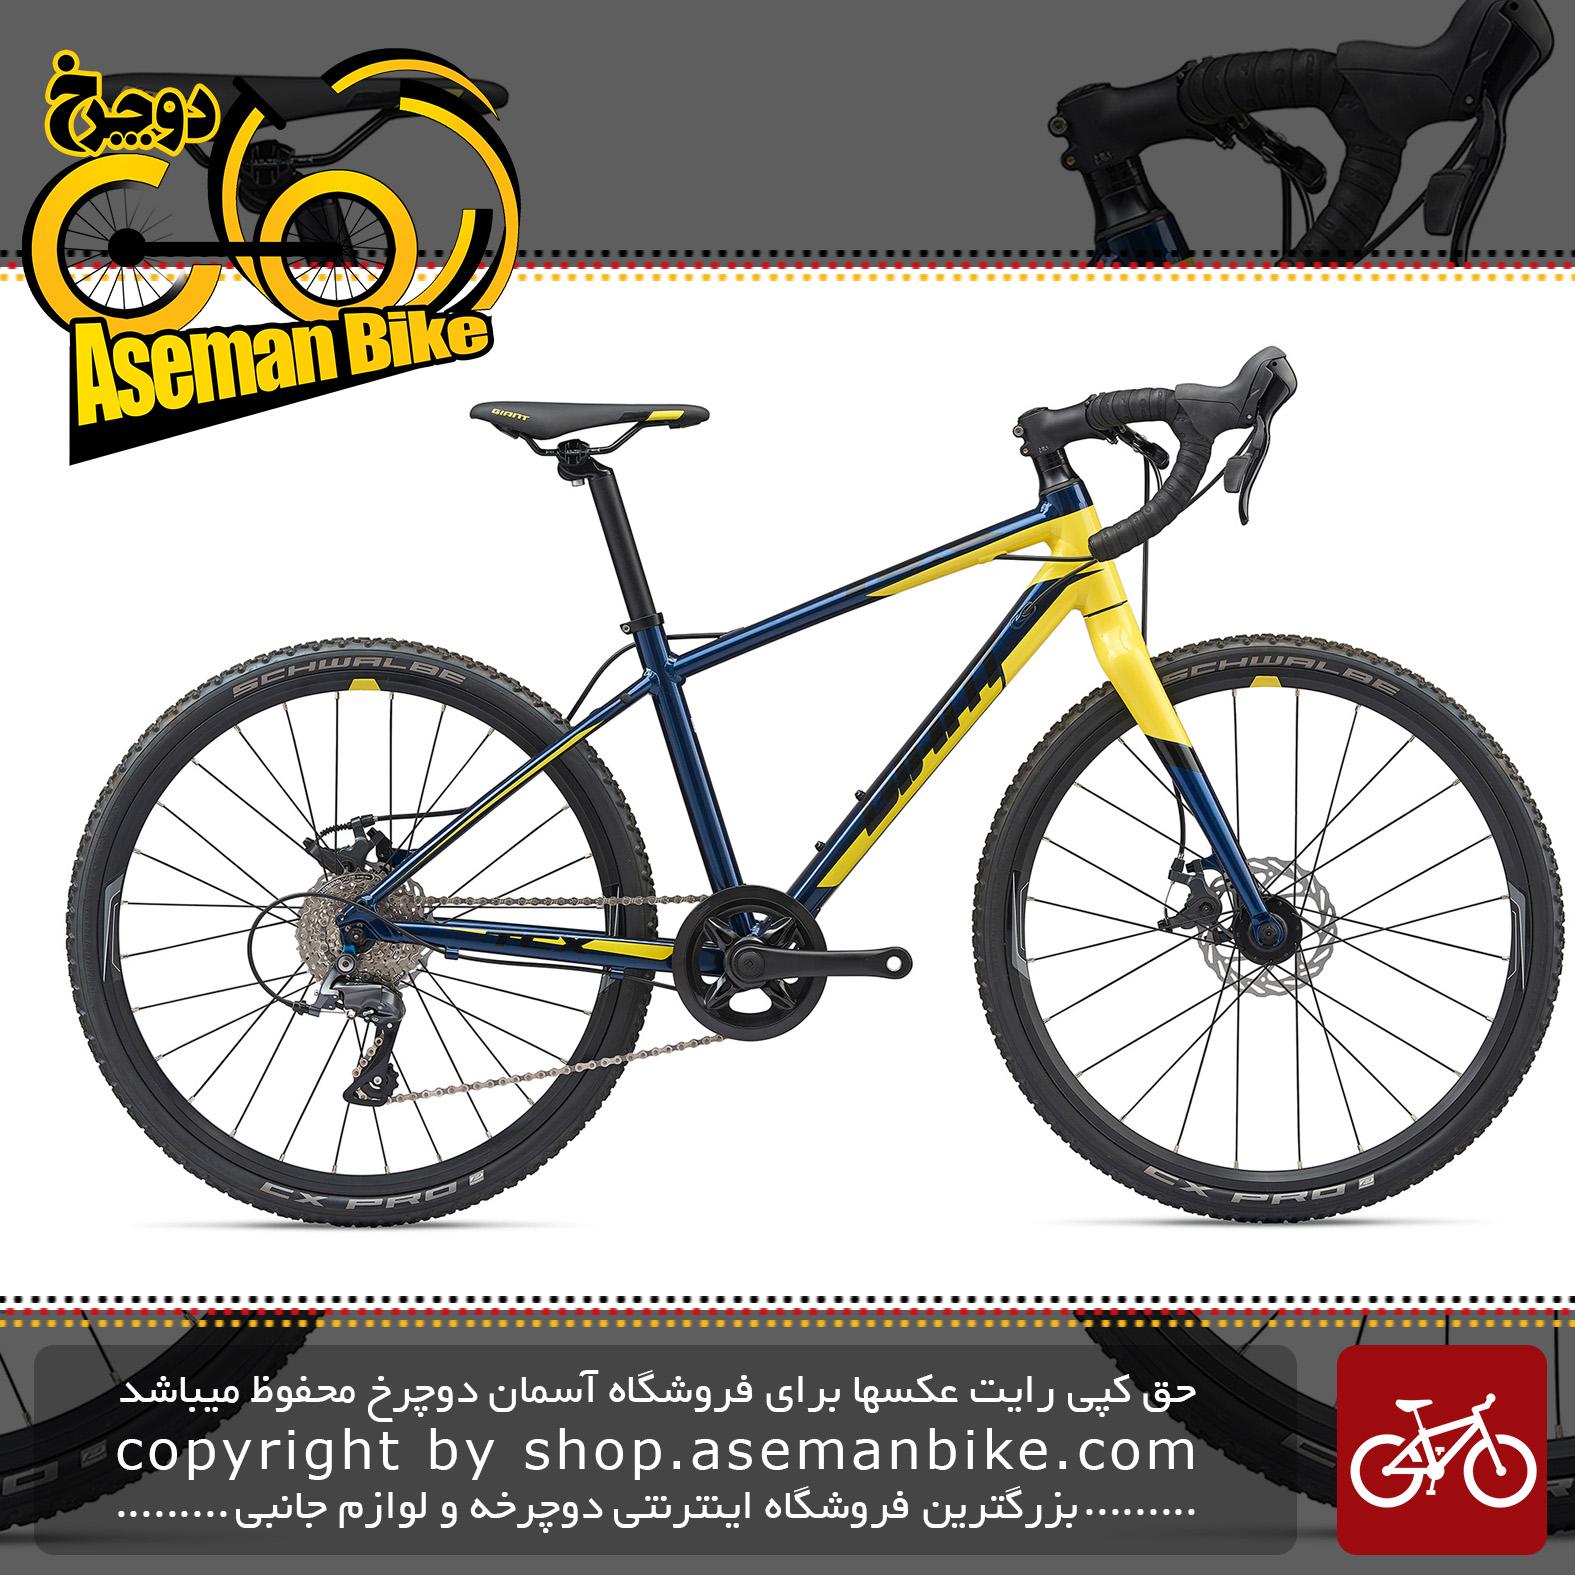 دوچرخه جاده کورسی جاینت مدل تی سی ایکس اسپویر سایز 24 2020 Giant Onroad Bicycle TCX Espoir 24 2020